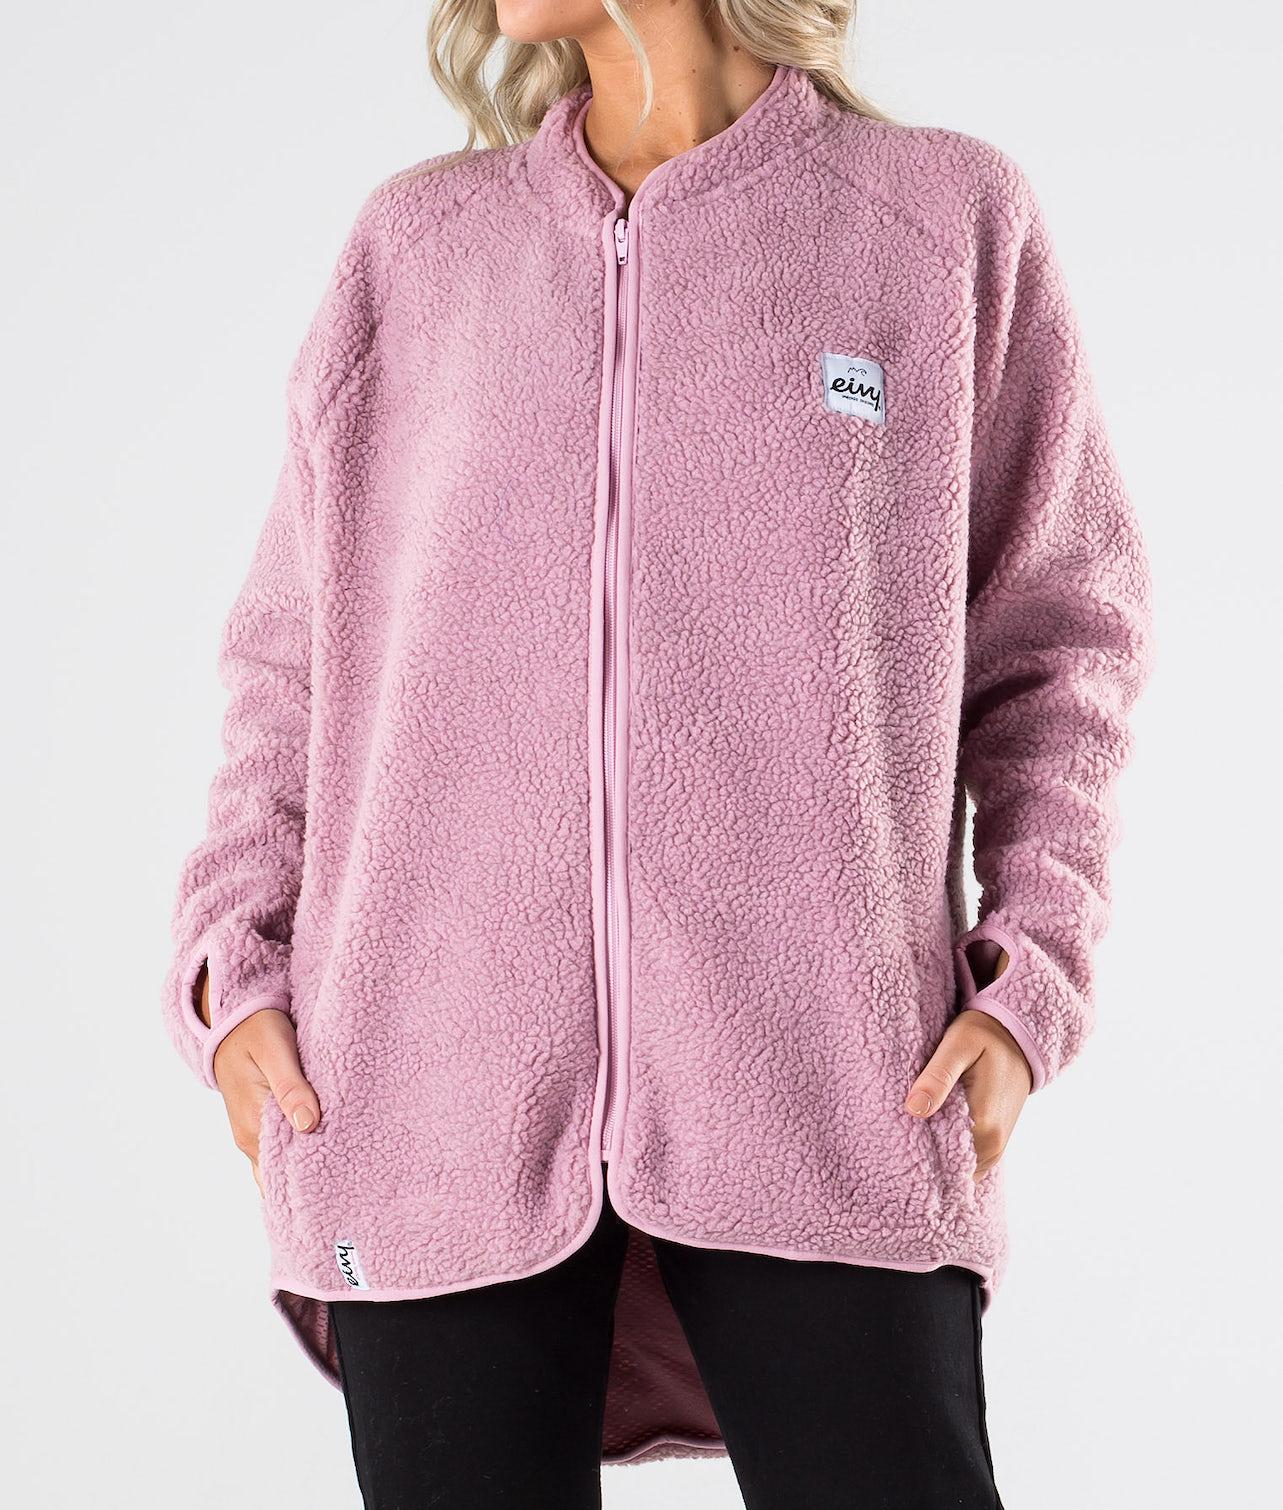 Eivy Redwood Sherpa Jacket Tröja Faded Pink